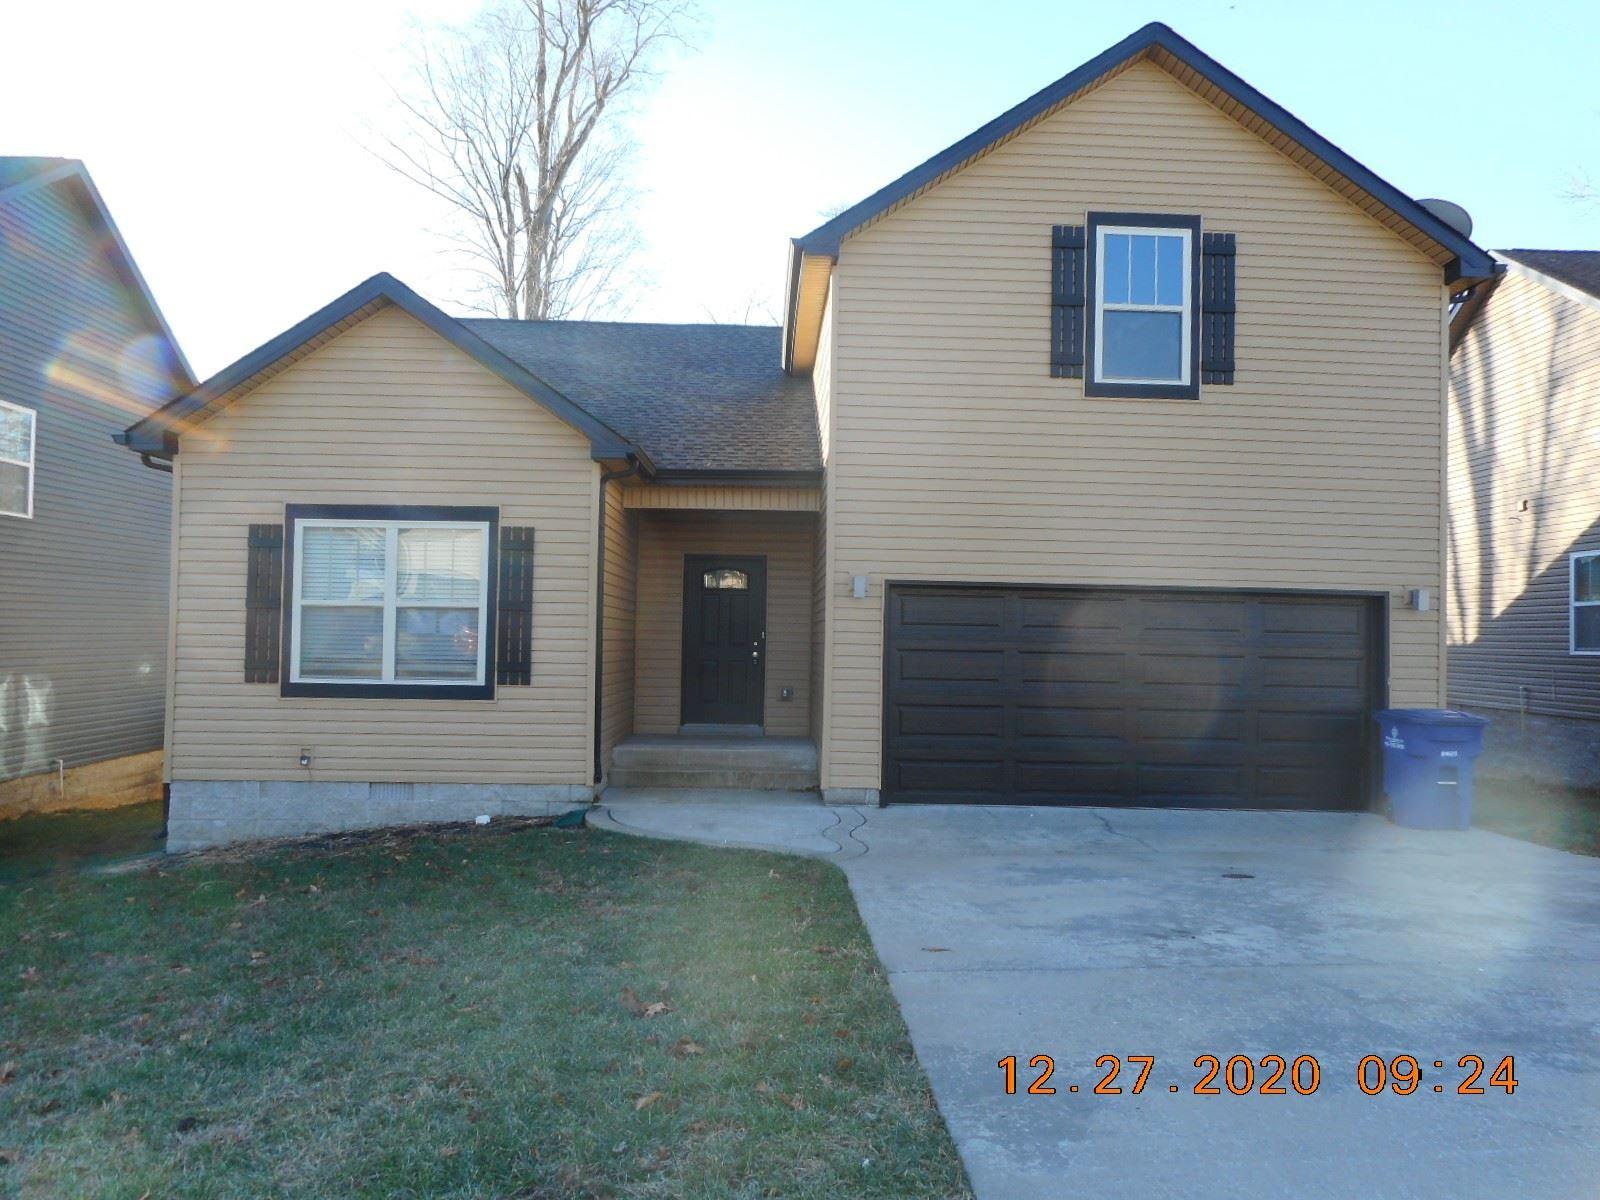 1196 Belvoir Ln, Clarksville, TN 37040 - MLS#: 2218331